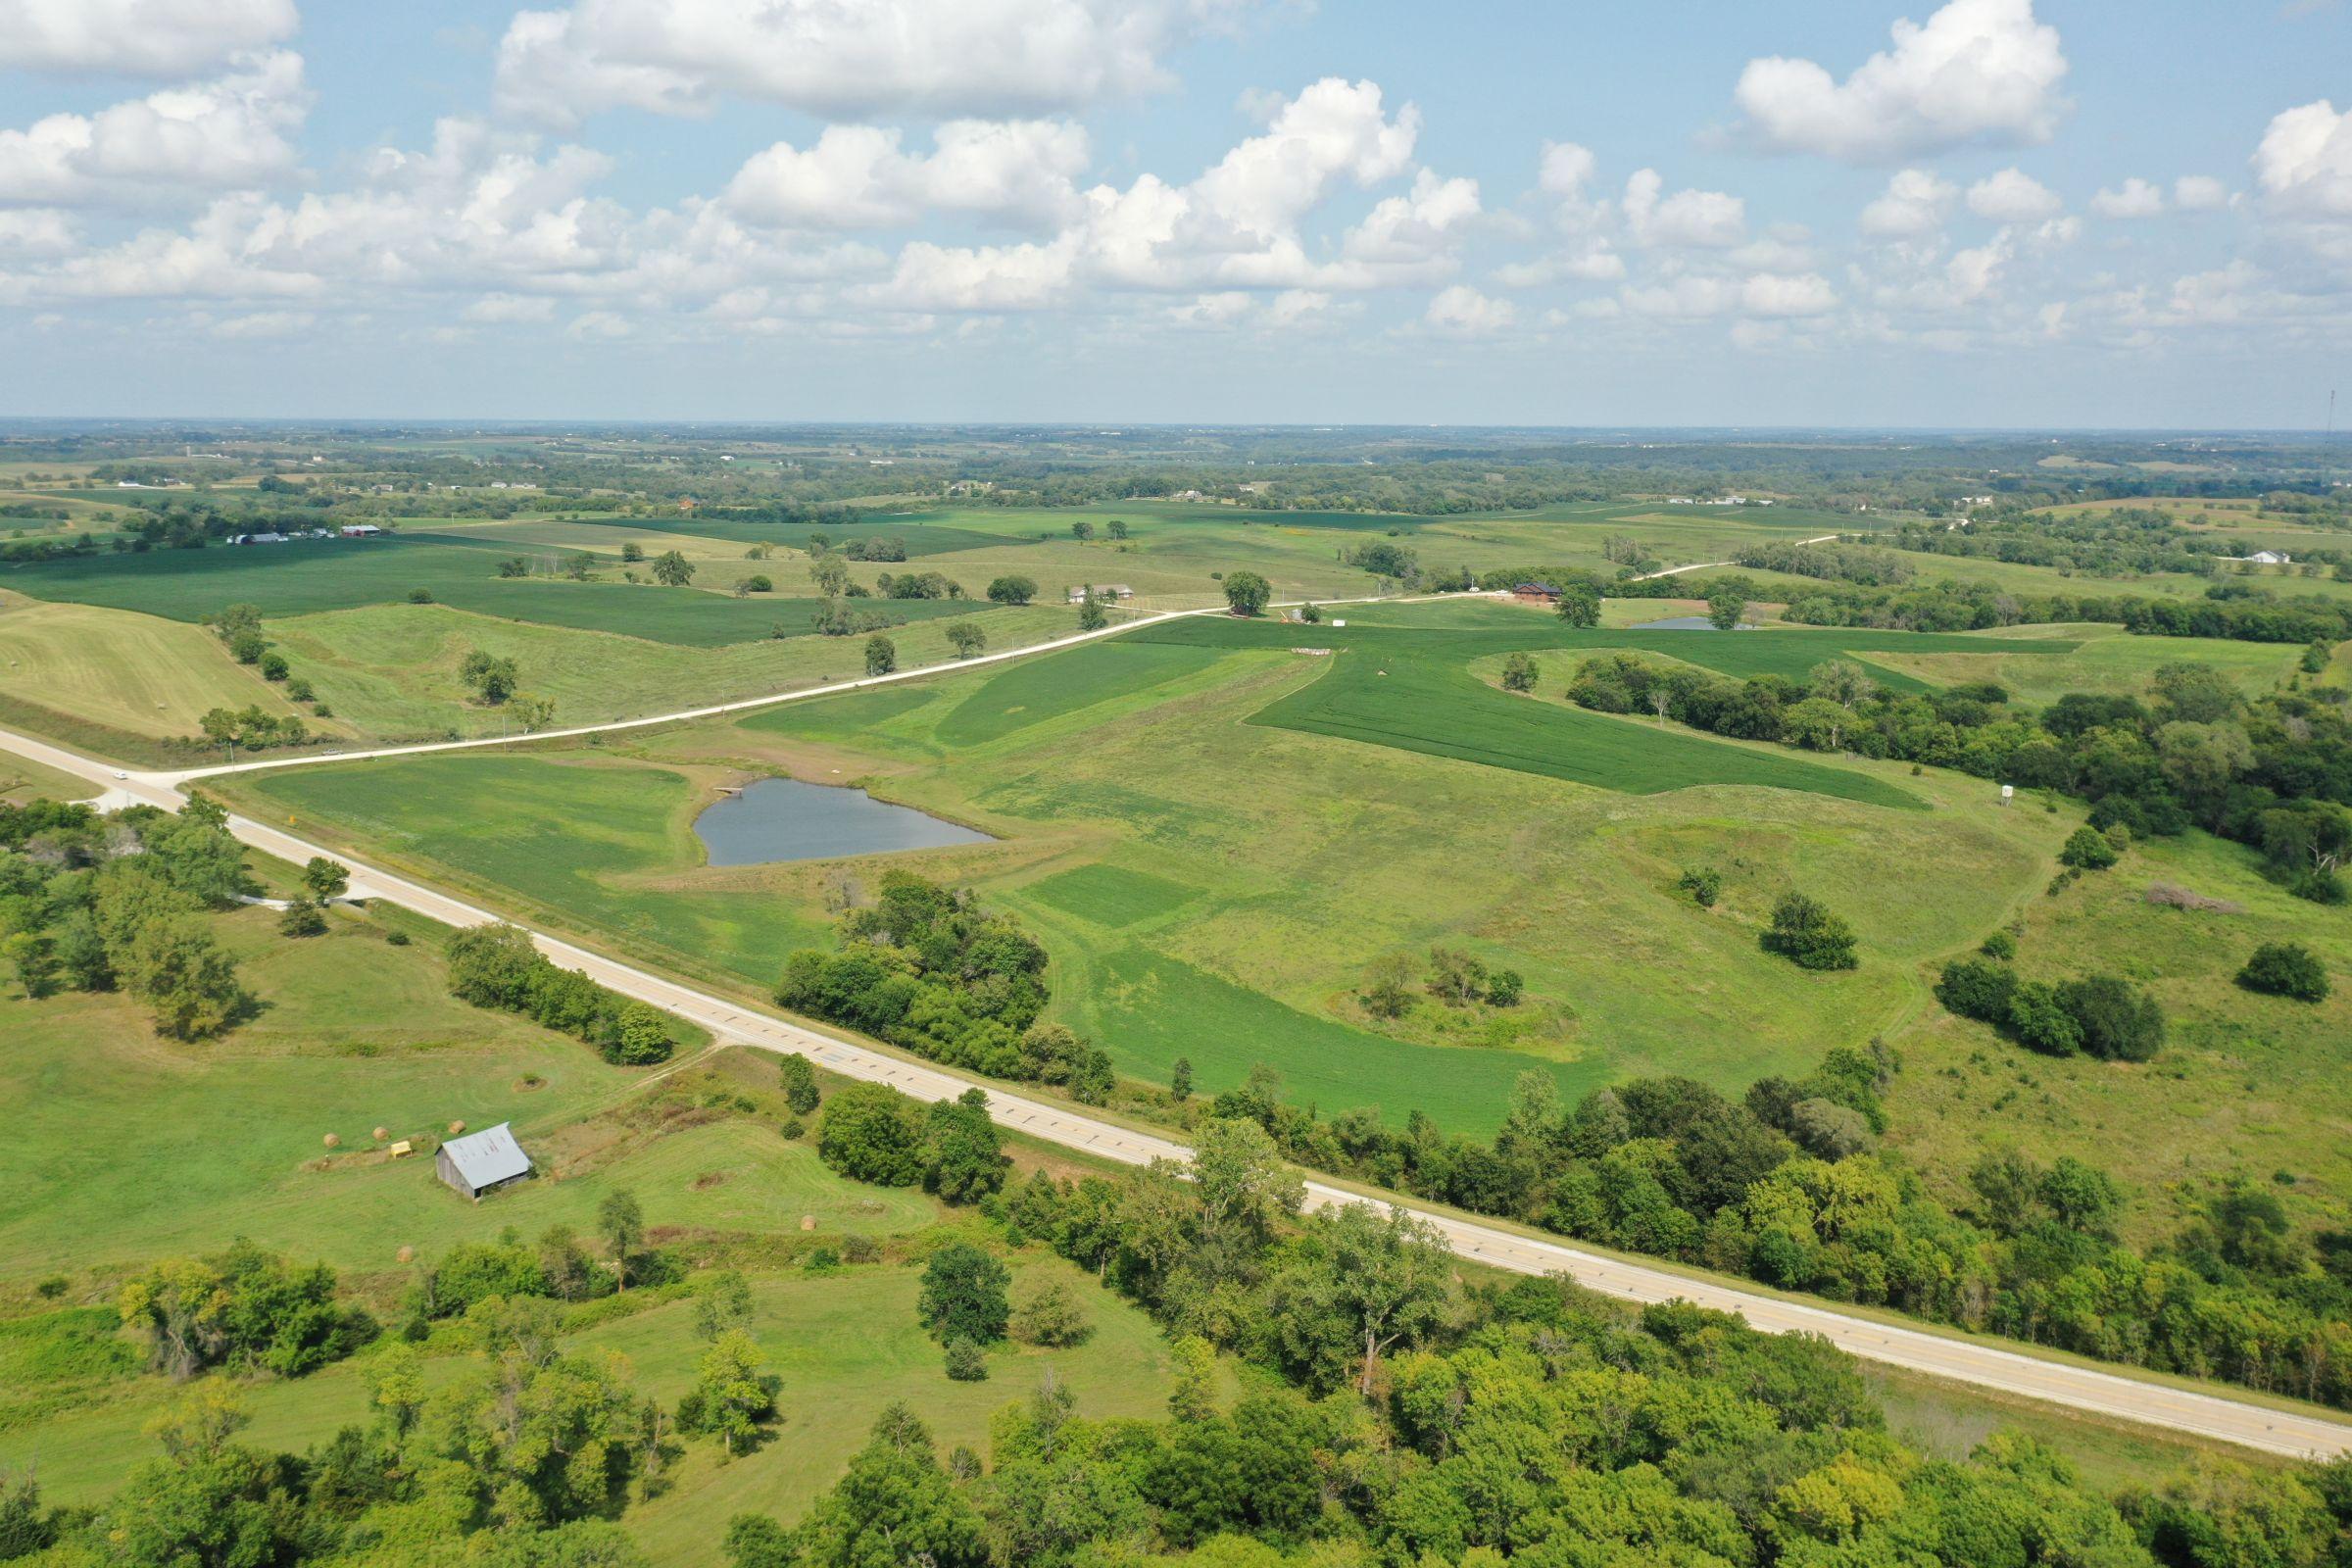 land-warren-county-iowa-12-acres-listing-number-15694-1-2021-08-20-171049.JPG